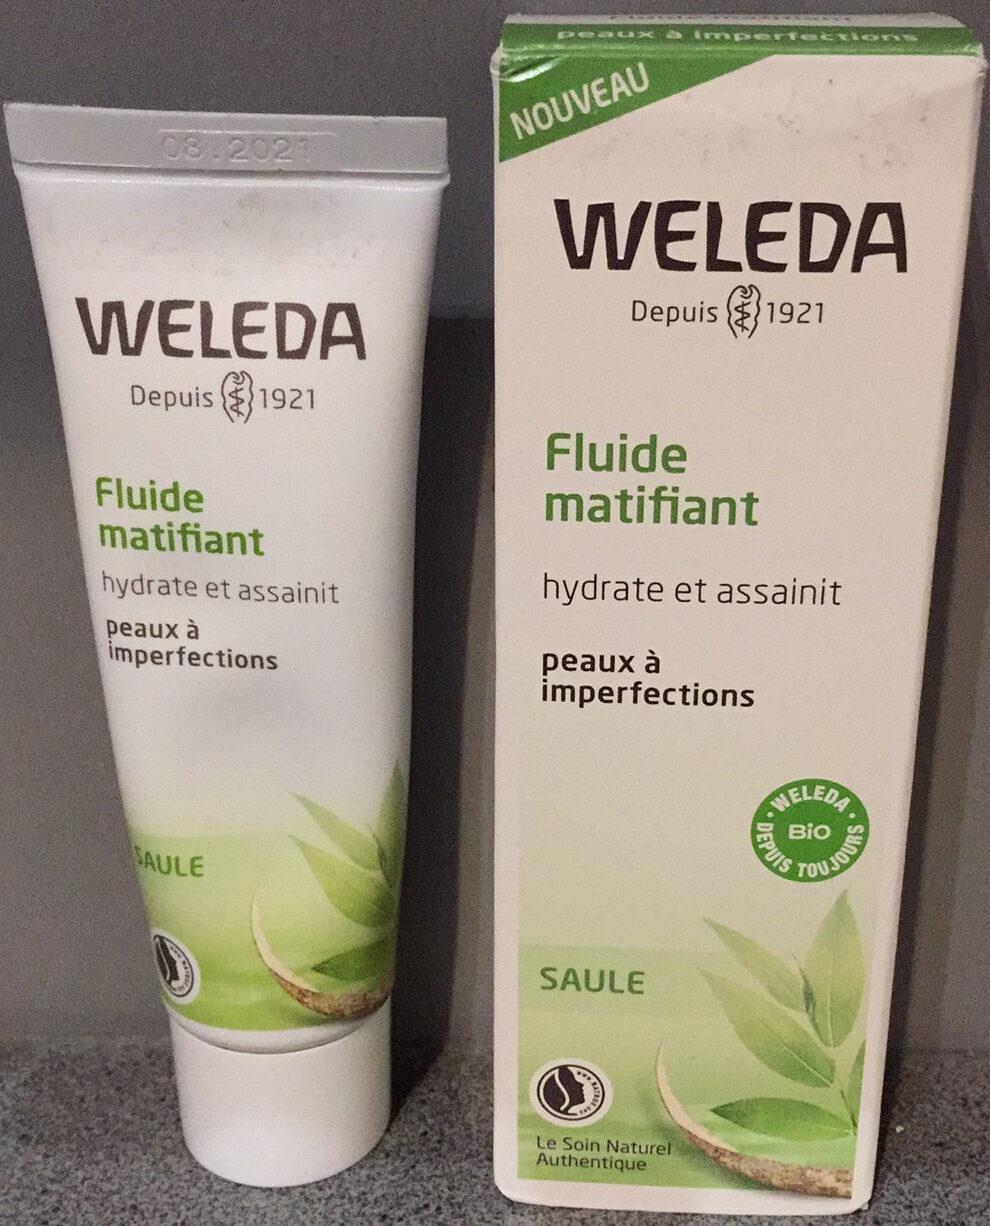 Fluide matifiant - Product - fr